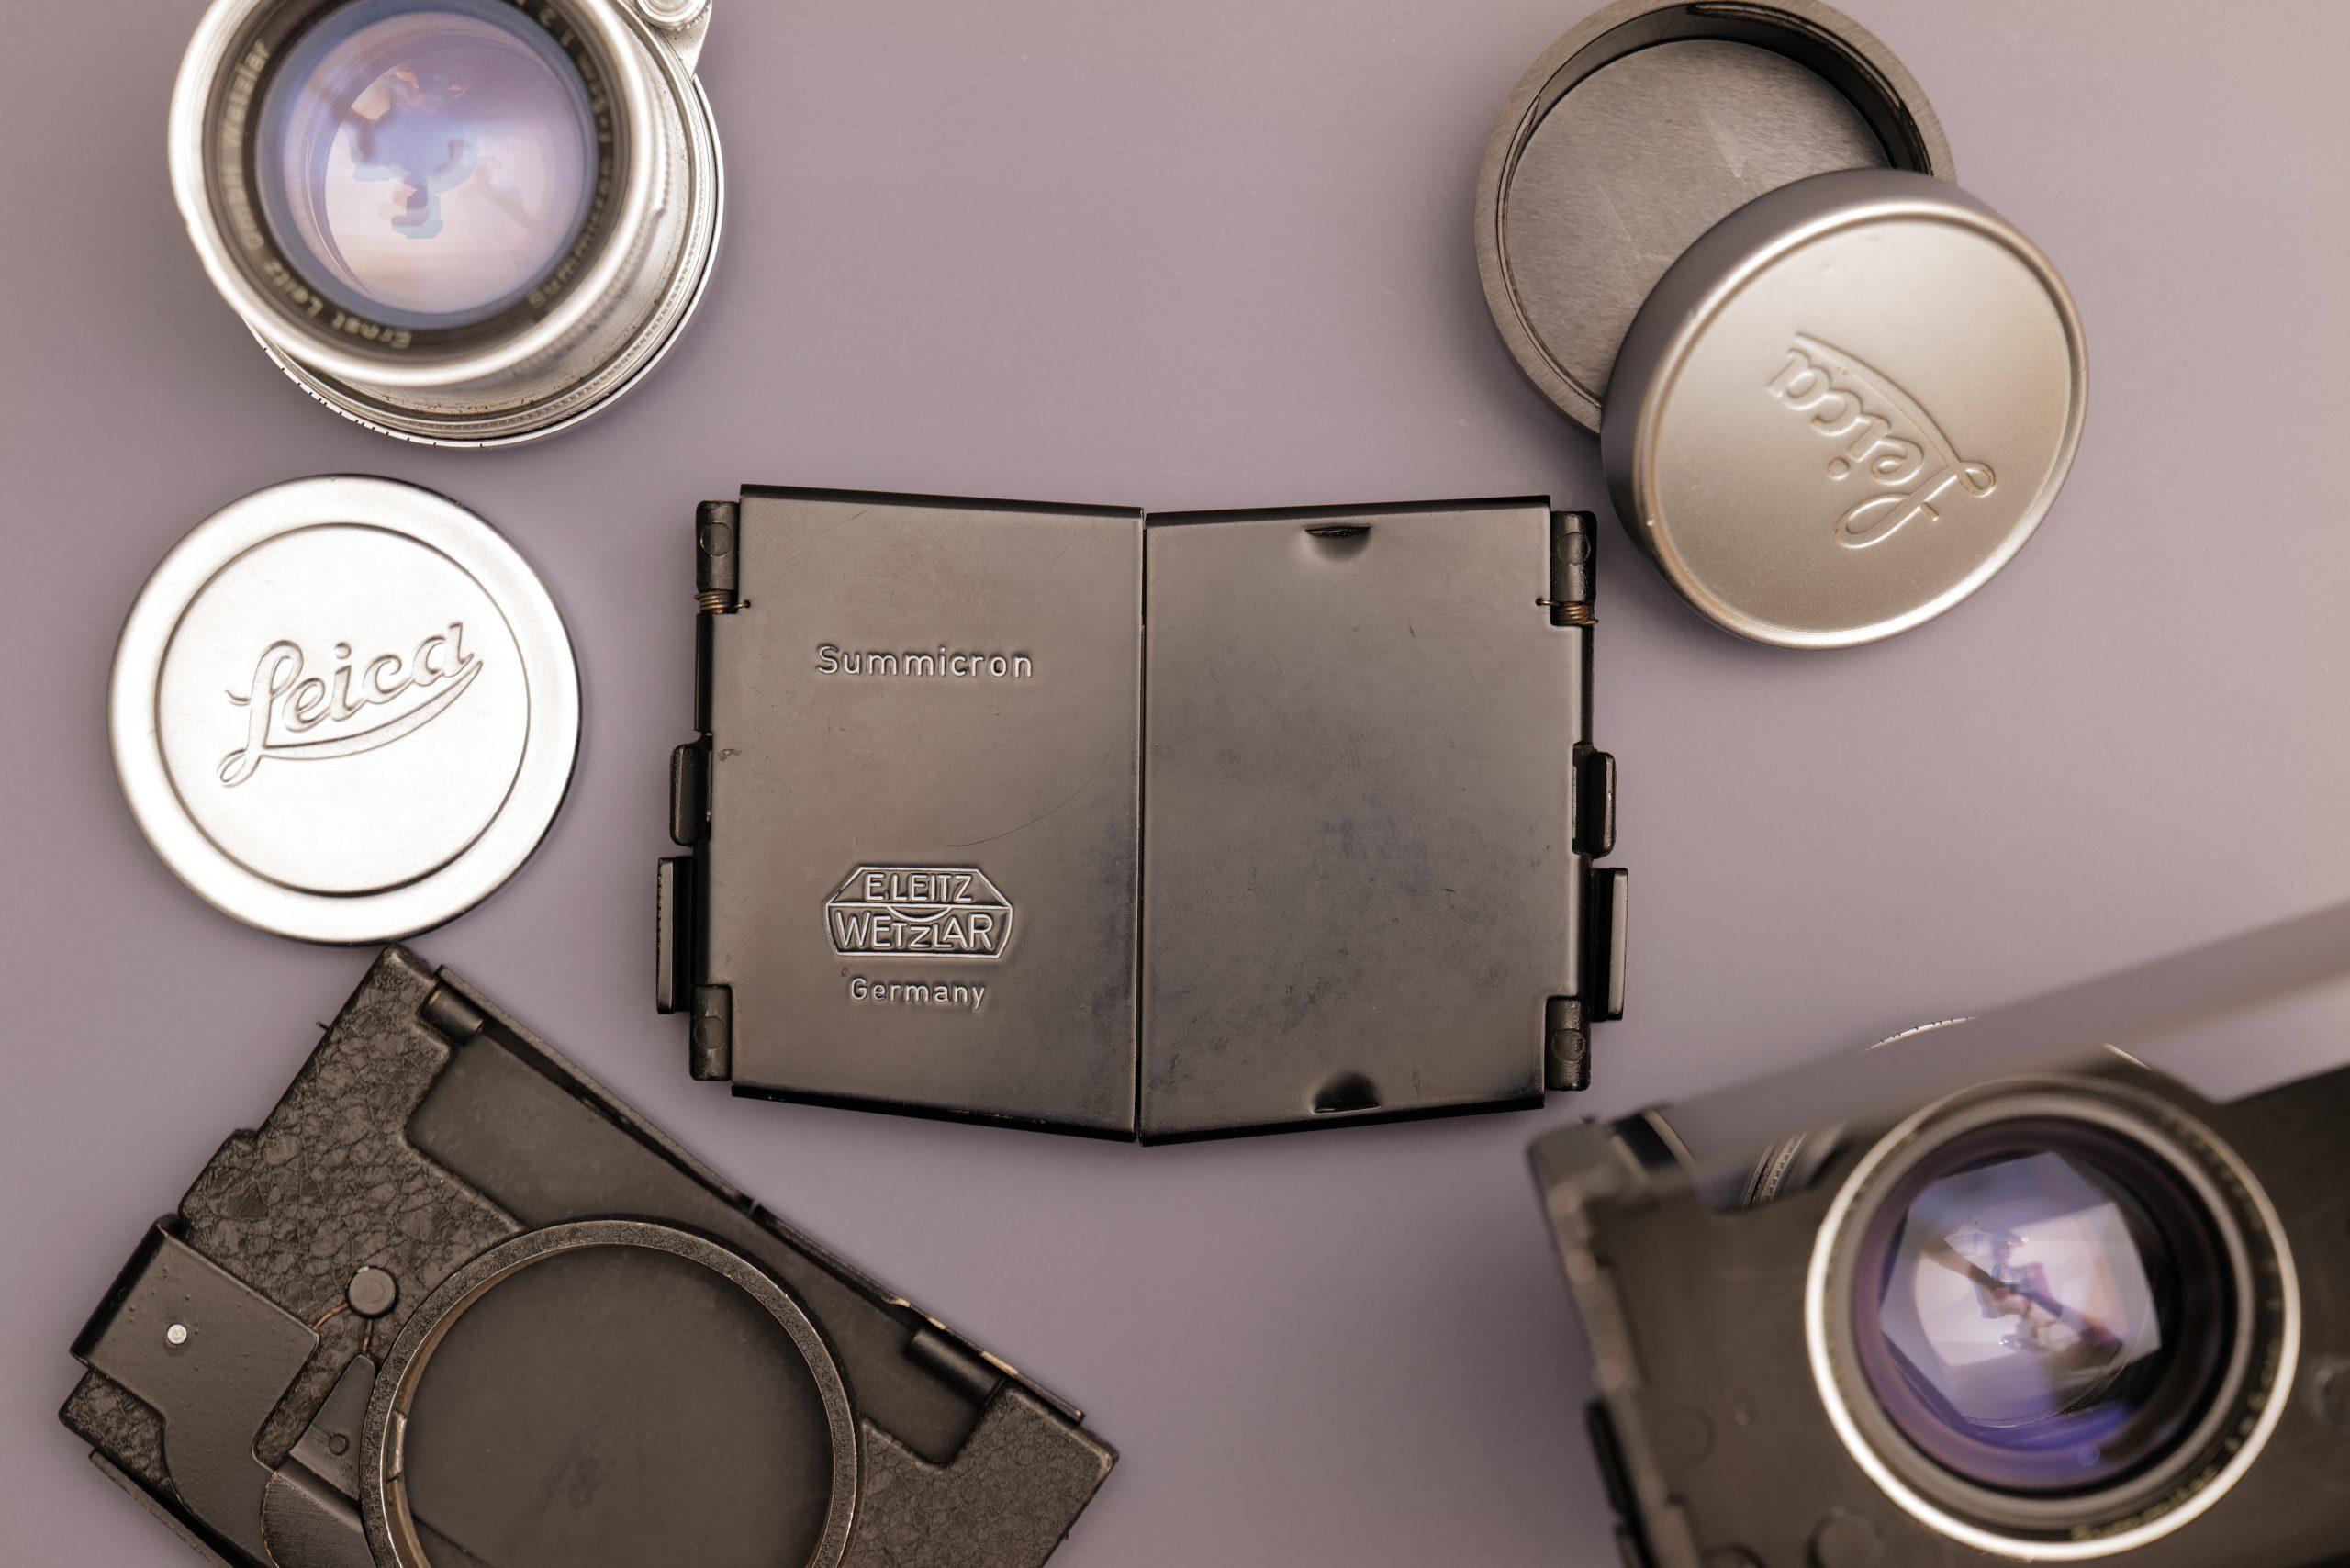 【Leica】SOOPDとSOOFMというフード